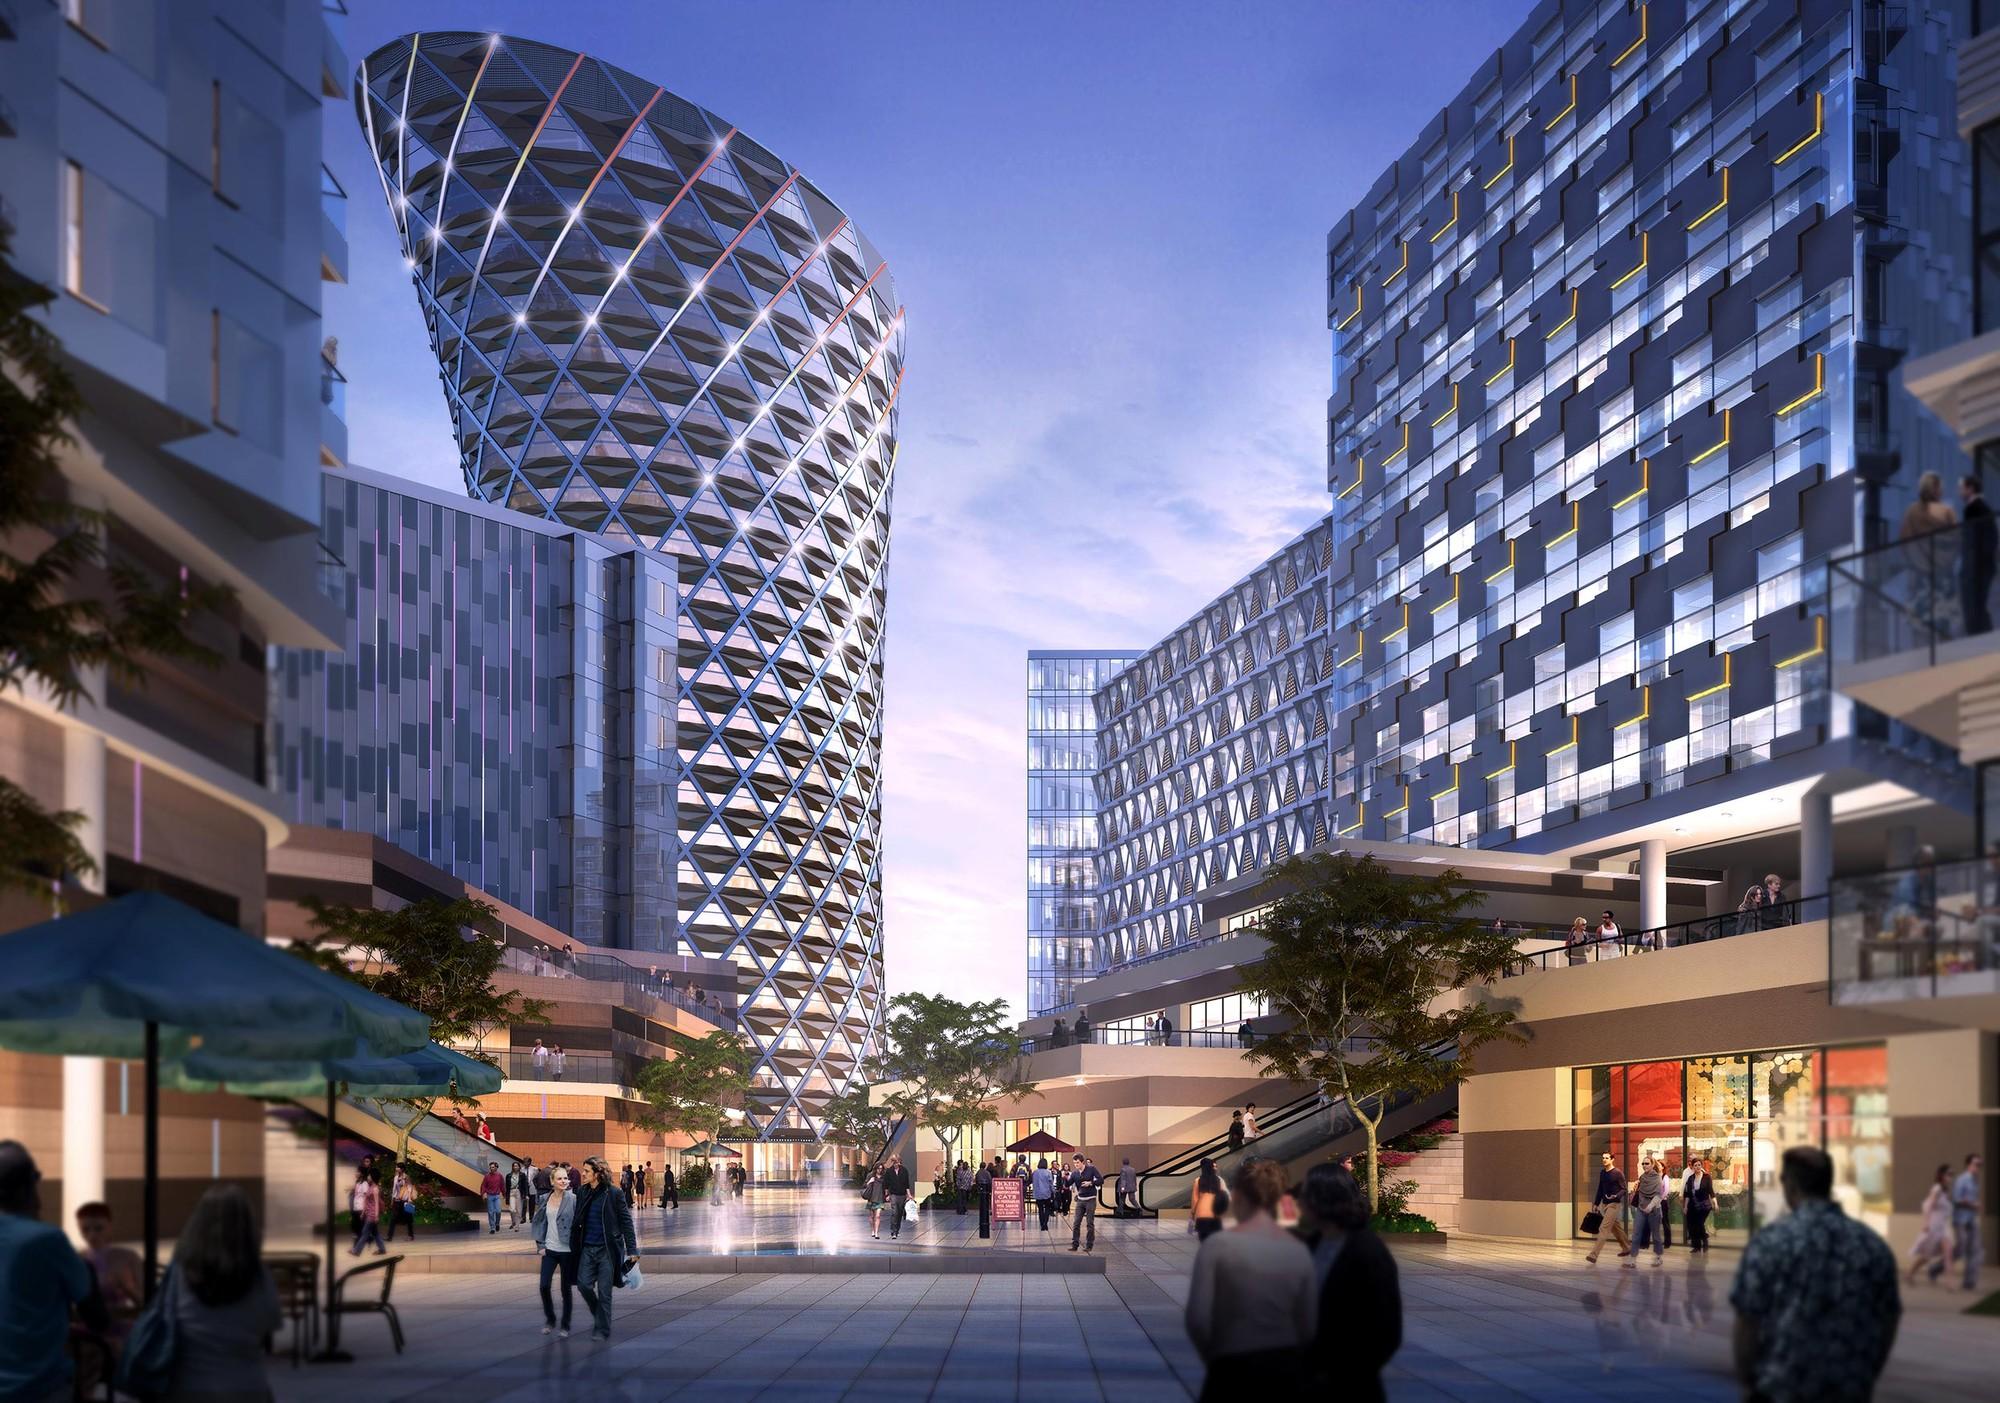 Broadway malyan designs new urban district in chengdu - Broadway malyan ...